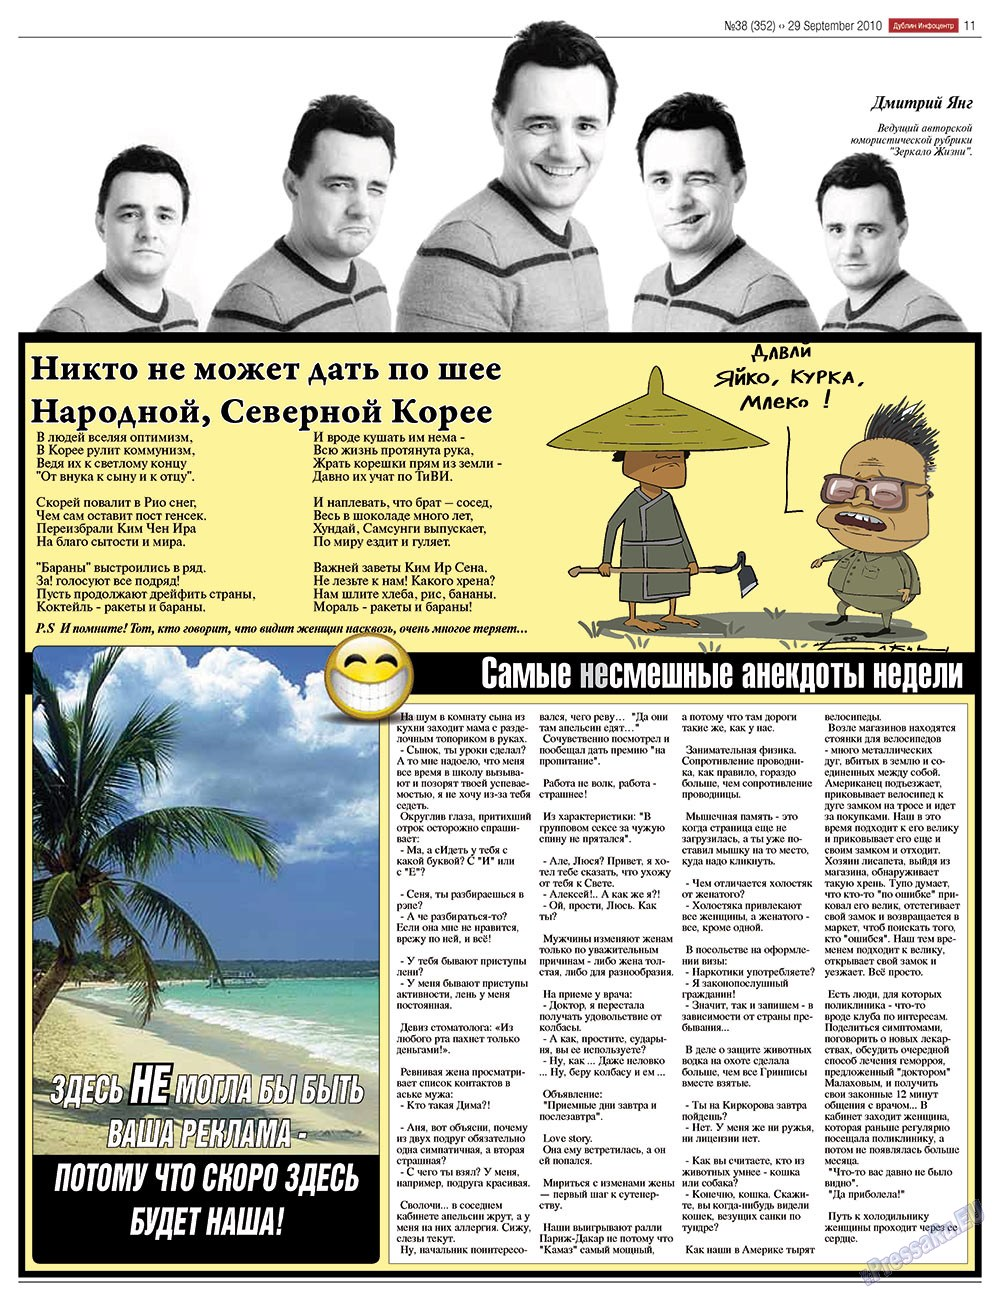 Дублин инфоцентр (газета). 2010 год, номер 38, стр. 11